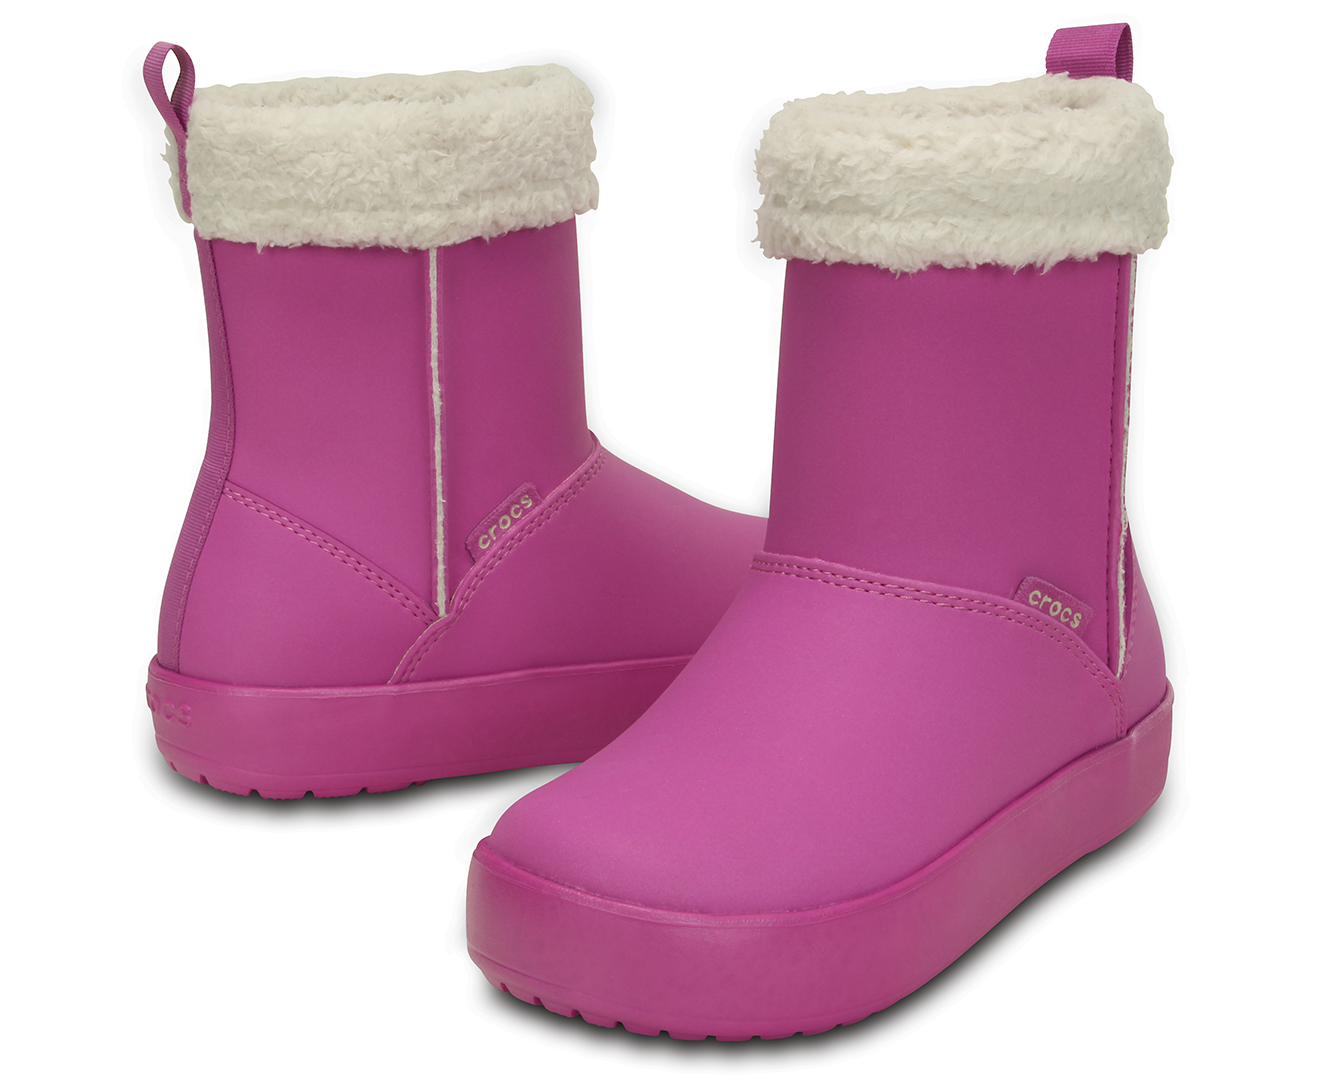 fc3a39c73c5130 Crocs Girls  Junior ColorLite Boot - Wild Orchid Oatmeal